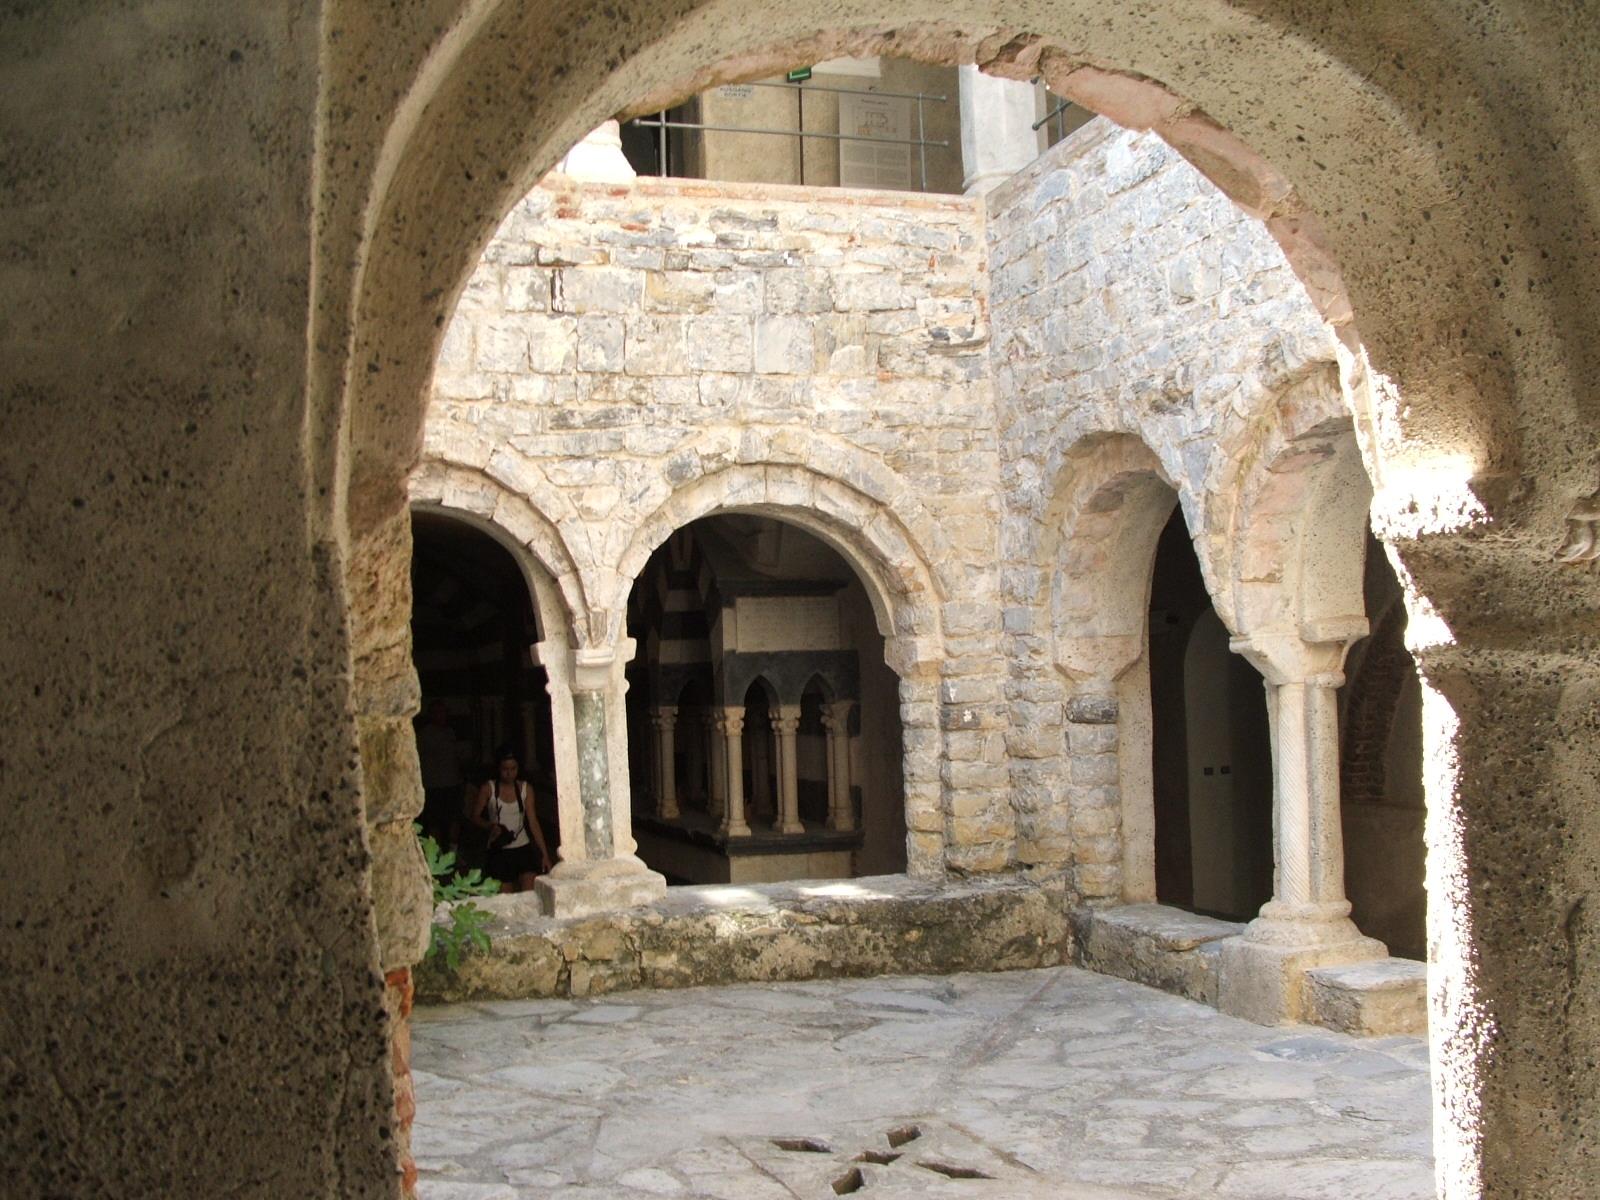 abbazia-di-san-fruttuoso-di-camogli-dscf0711_1396641379